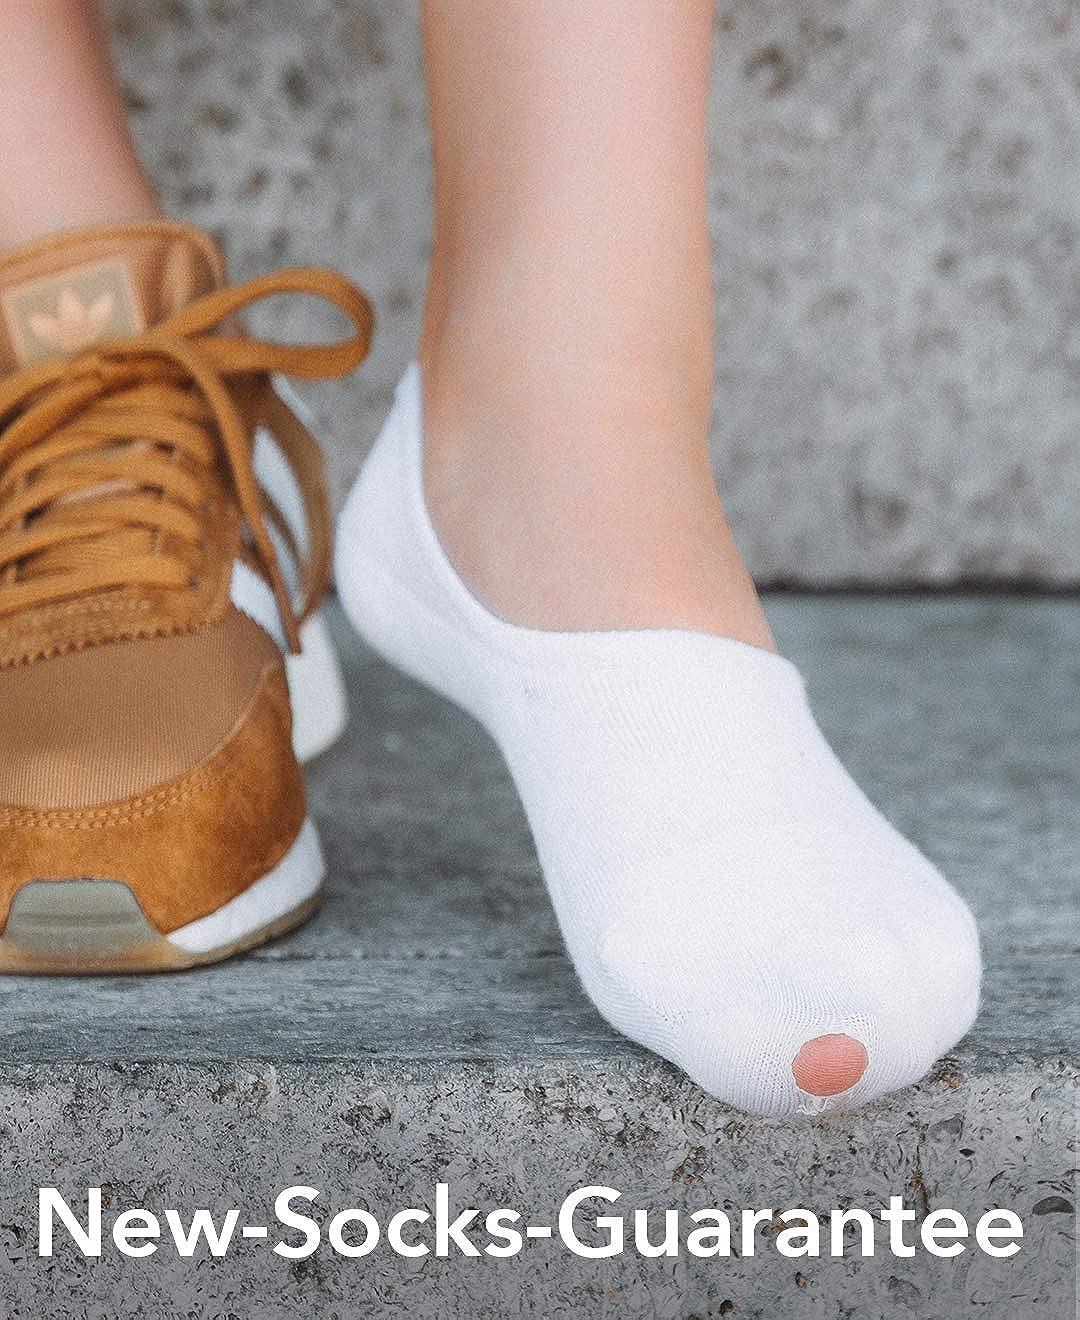 Blanco Snocks Calcetines pinkies unisex para Sneaker 6 pares Tobilleros para Sneaker tama/ño: 35-50 color: Negro Rosa Gris Azul pinkies de algod/ón Calcetines invisibles